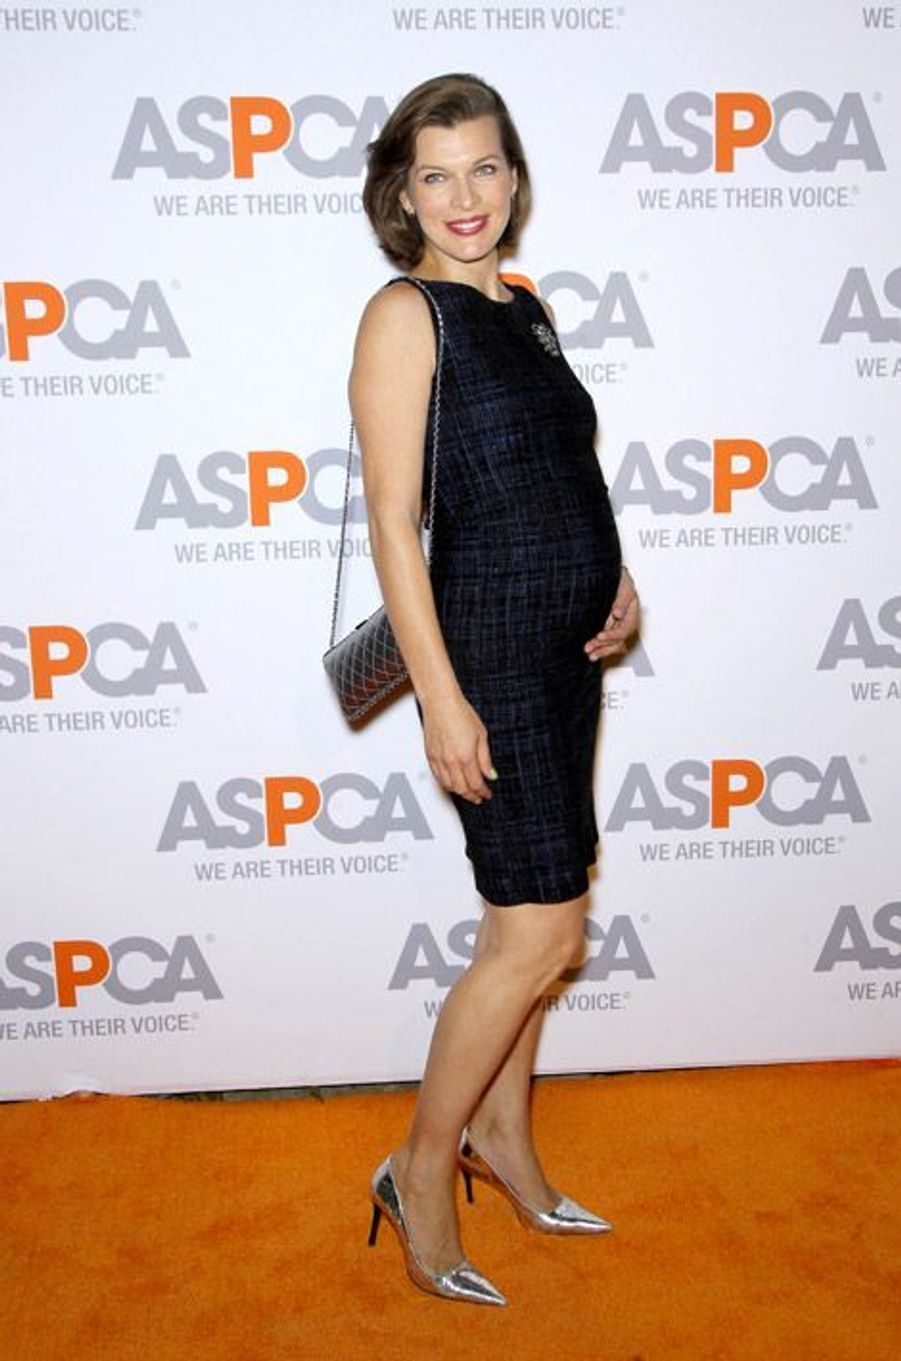 L'actrice Milla Jovovich, 38 ans, en Californie le 22 octobre 2014